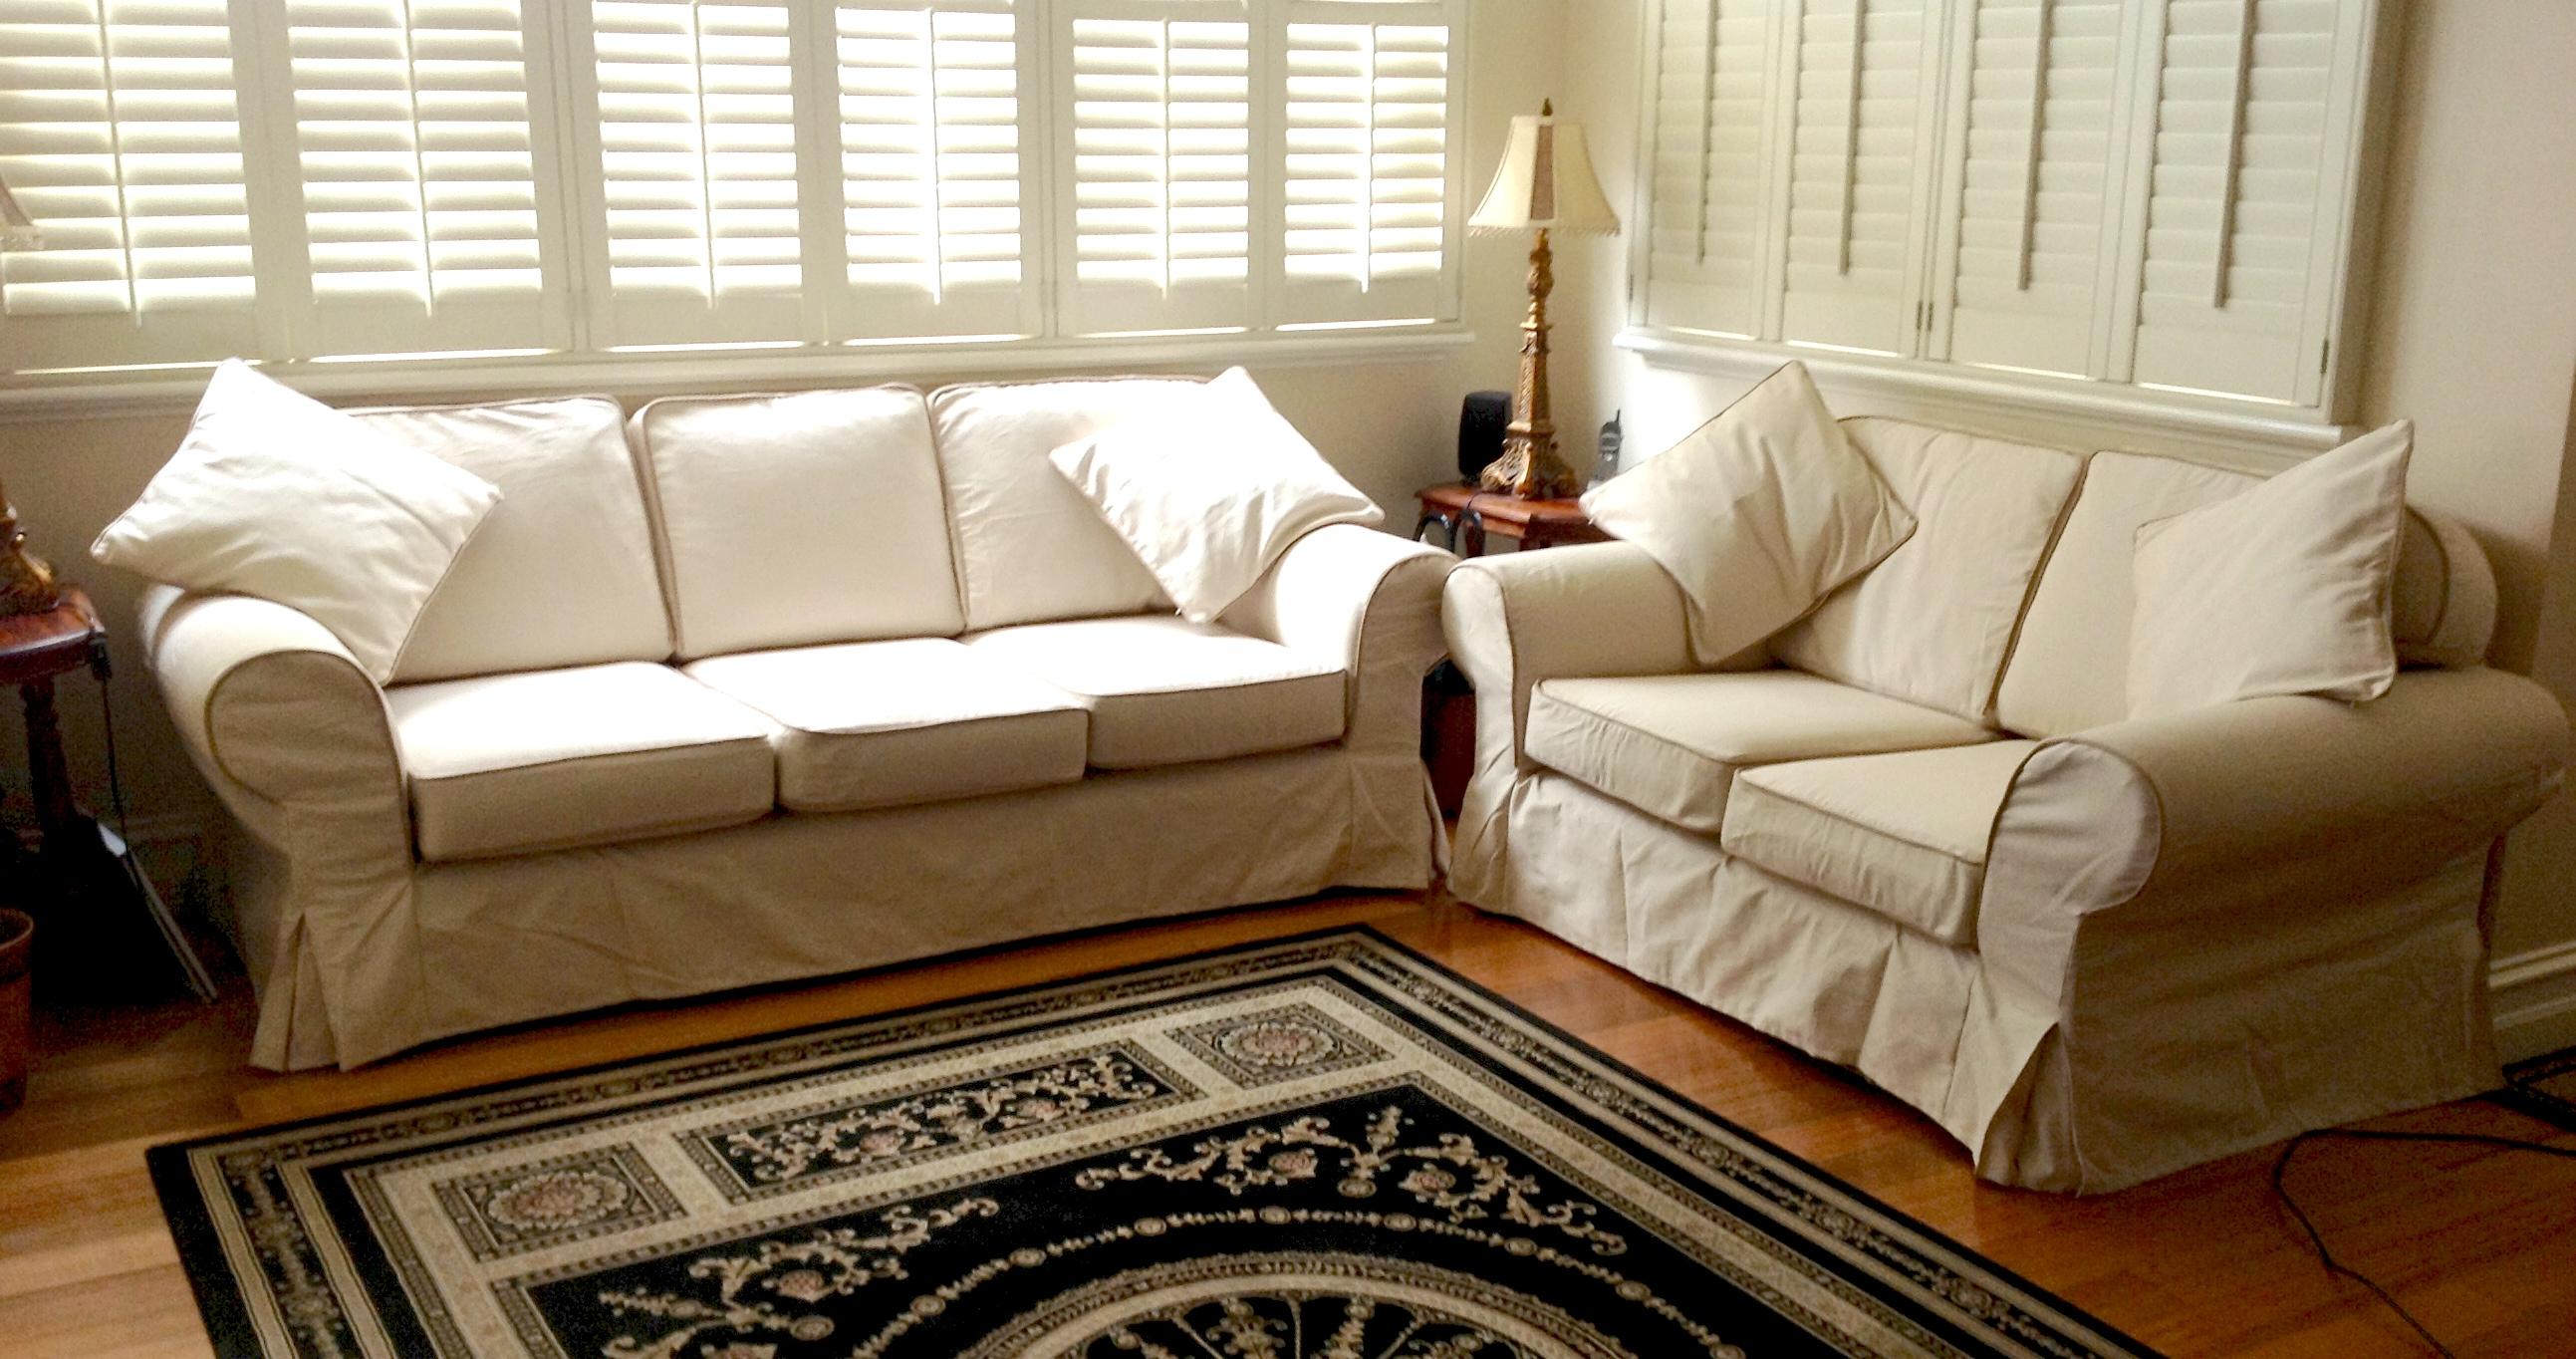 Decorative Slipcover Sofa For Astonishing Room Ideas